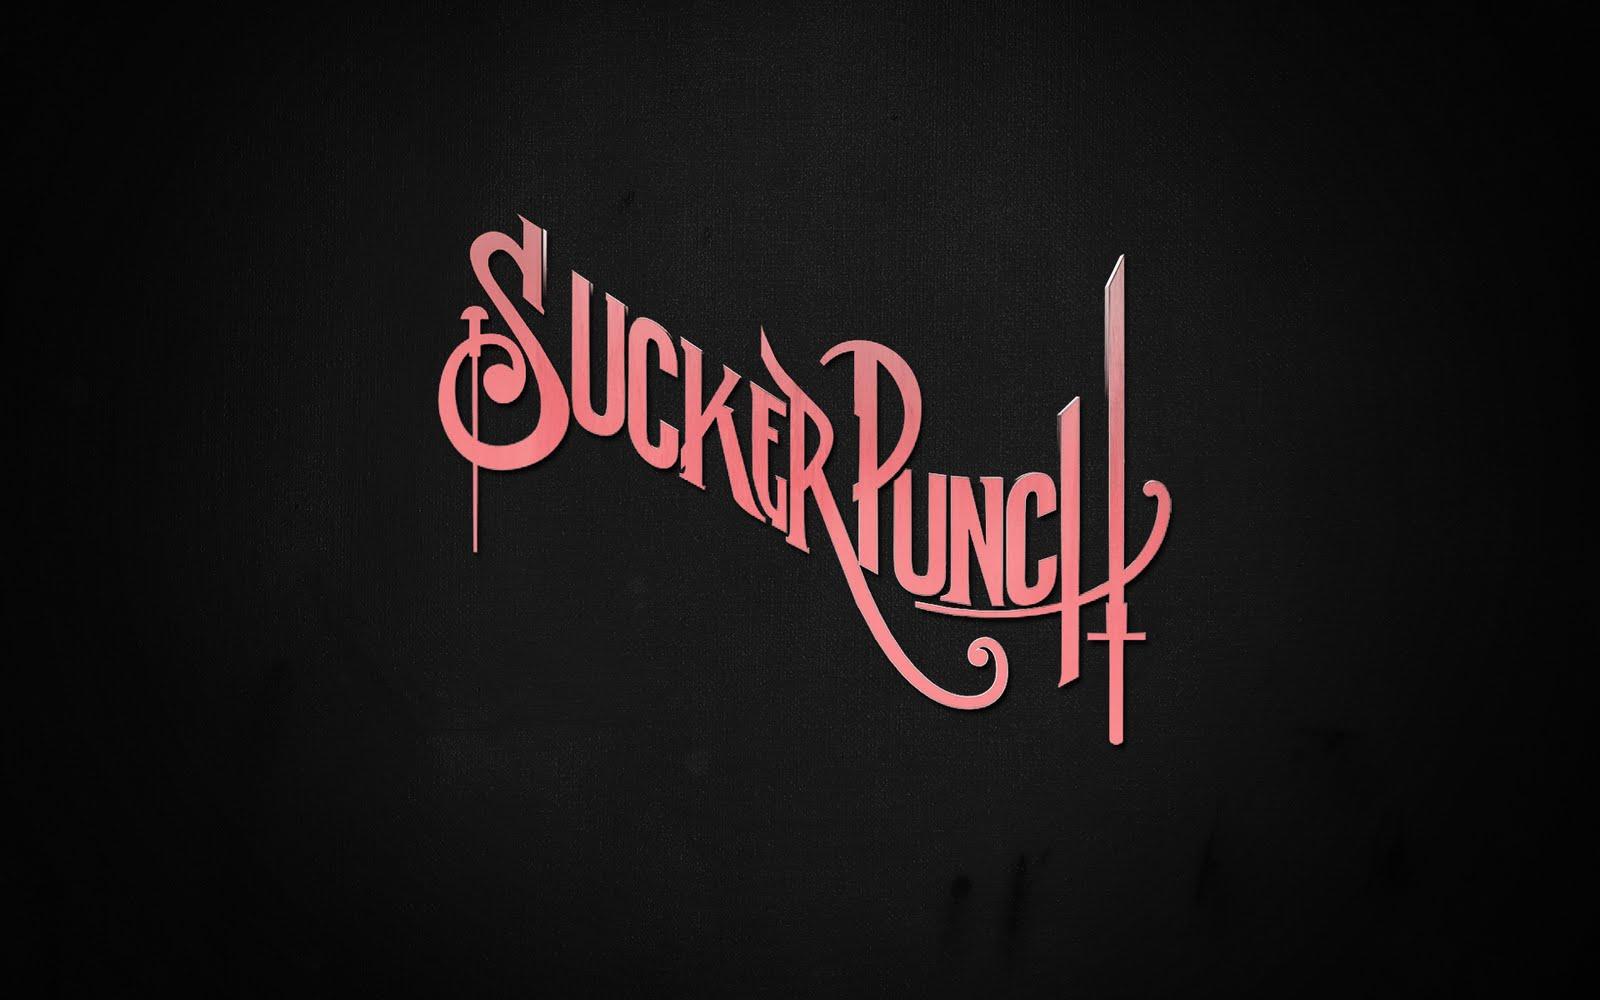 http://1.bp.blogspot.com/_V6TVDECge74/TGQV4ot4KnI/AAAAAAAAA_U/pxldLil5FiY/s1600/wallpaper+Sucker+Punch+2011.jpg